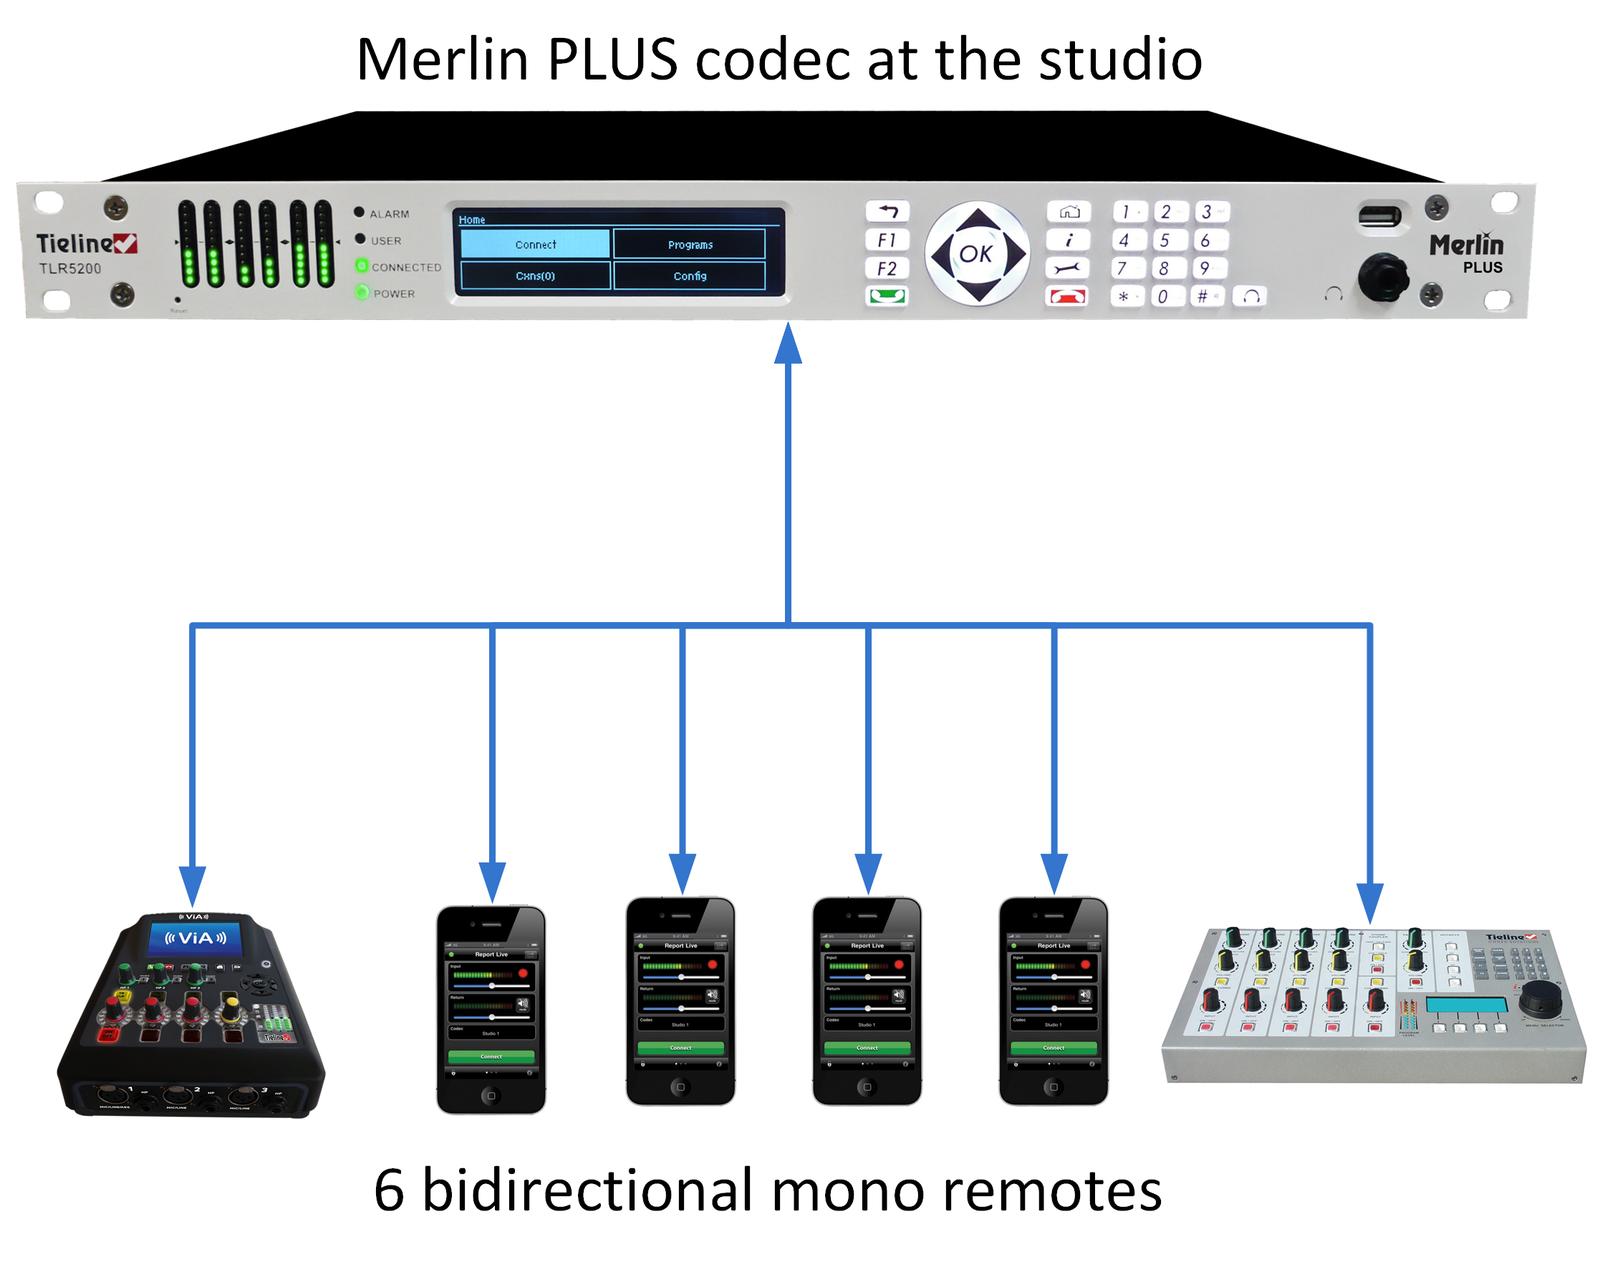 815_Merlin_PLUS_-_6_codecs_v.2_20160224